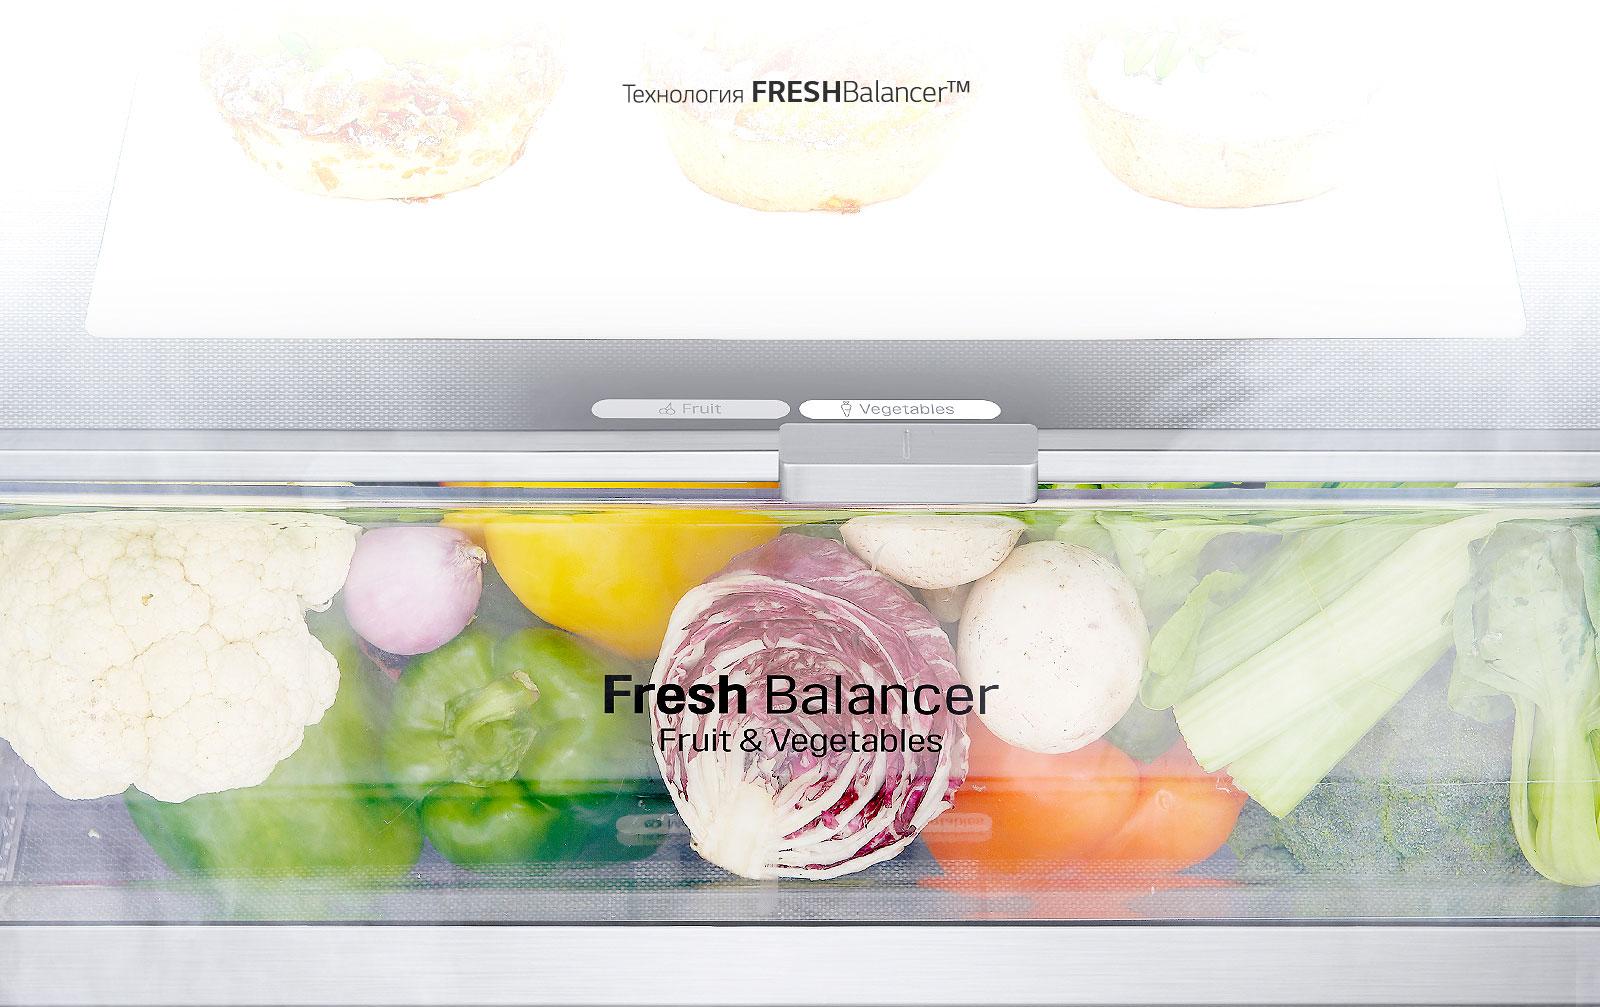 LG FreshBalancer